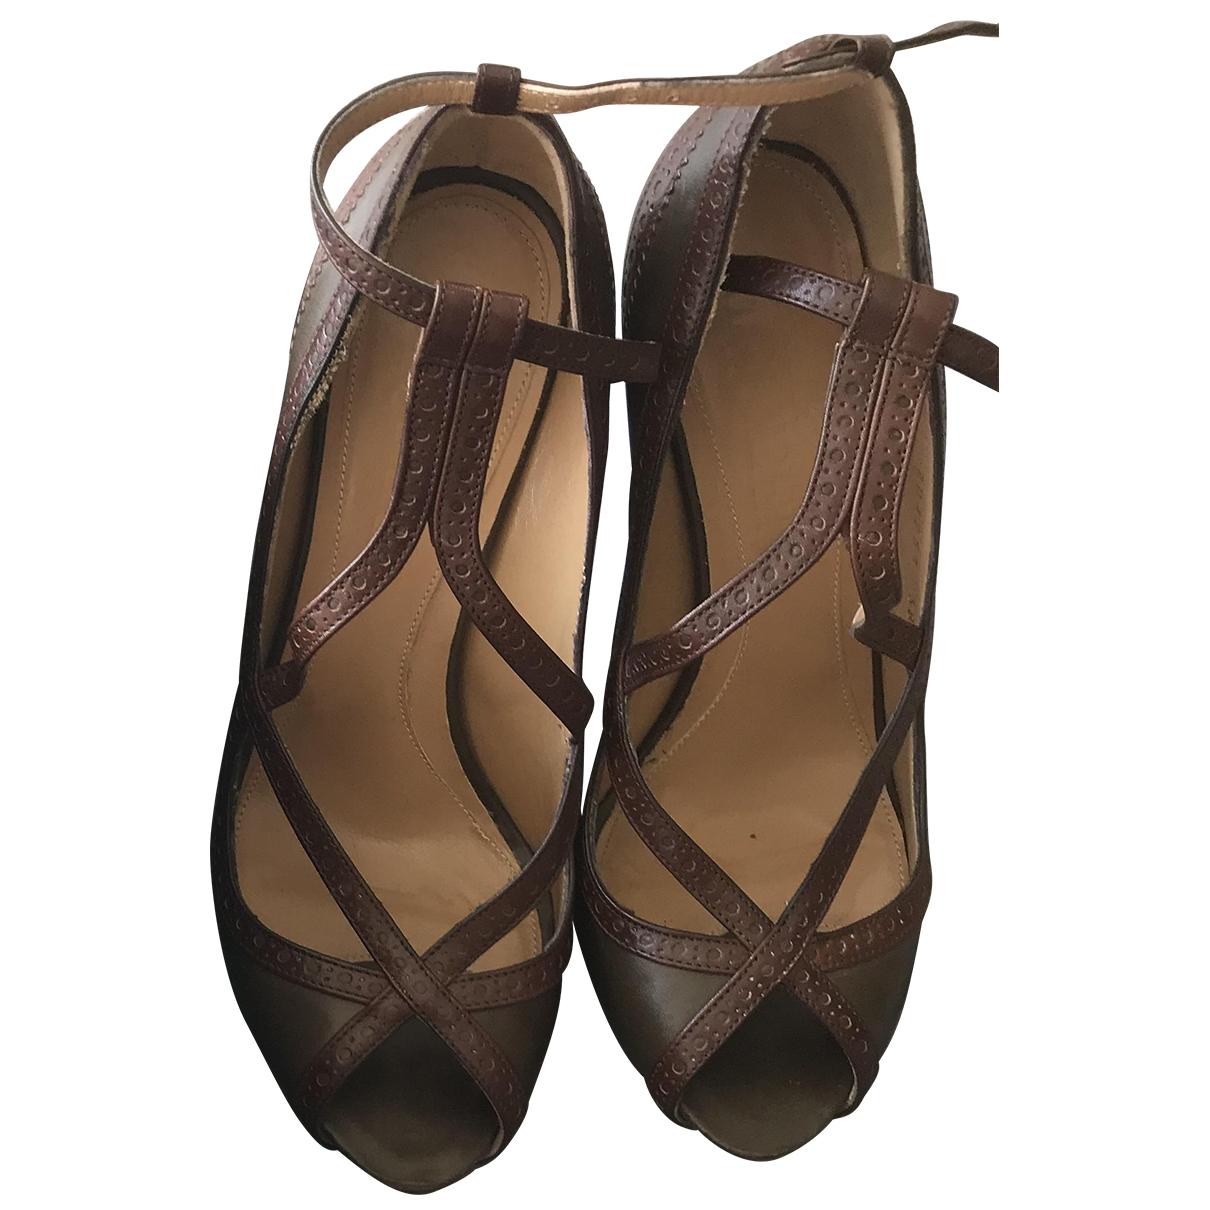 Alexander Mcqueen \N Khaki Leather Heels for Women 38 EU